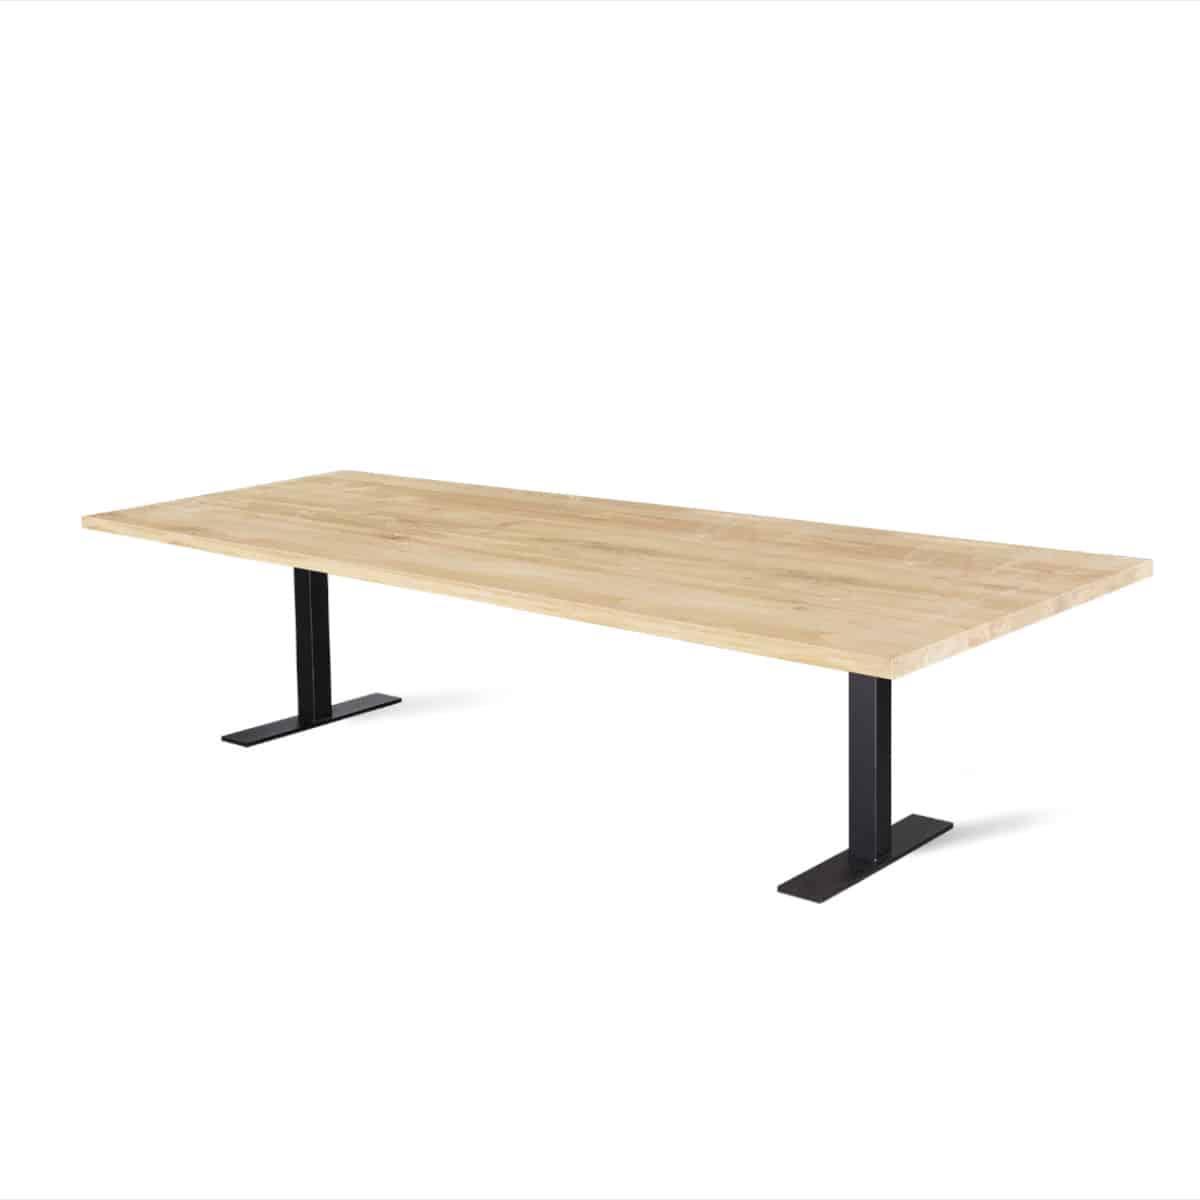 Massief eiken houten eikenhouten recht eettafel tafel eetkamer keuken meubelmaker friesland